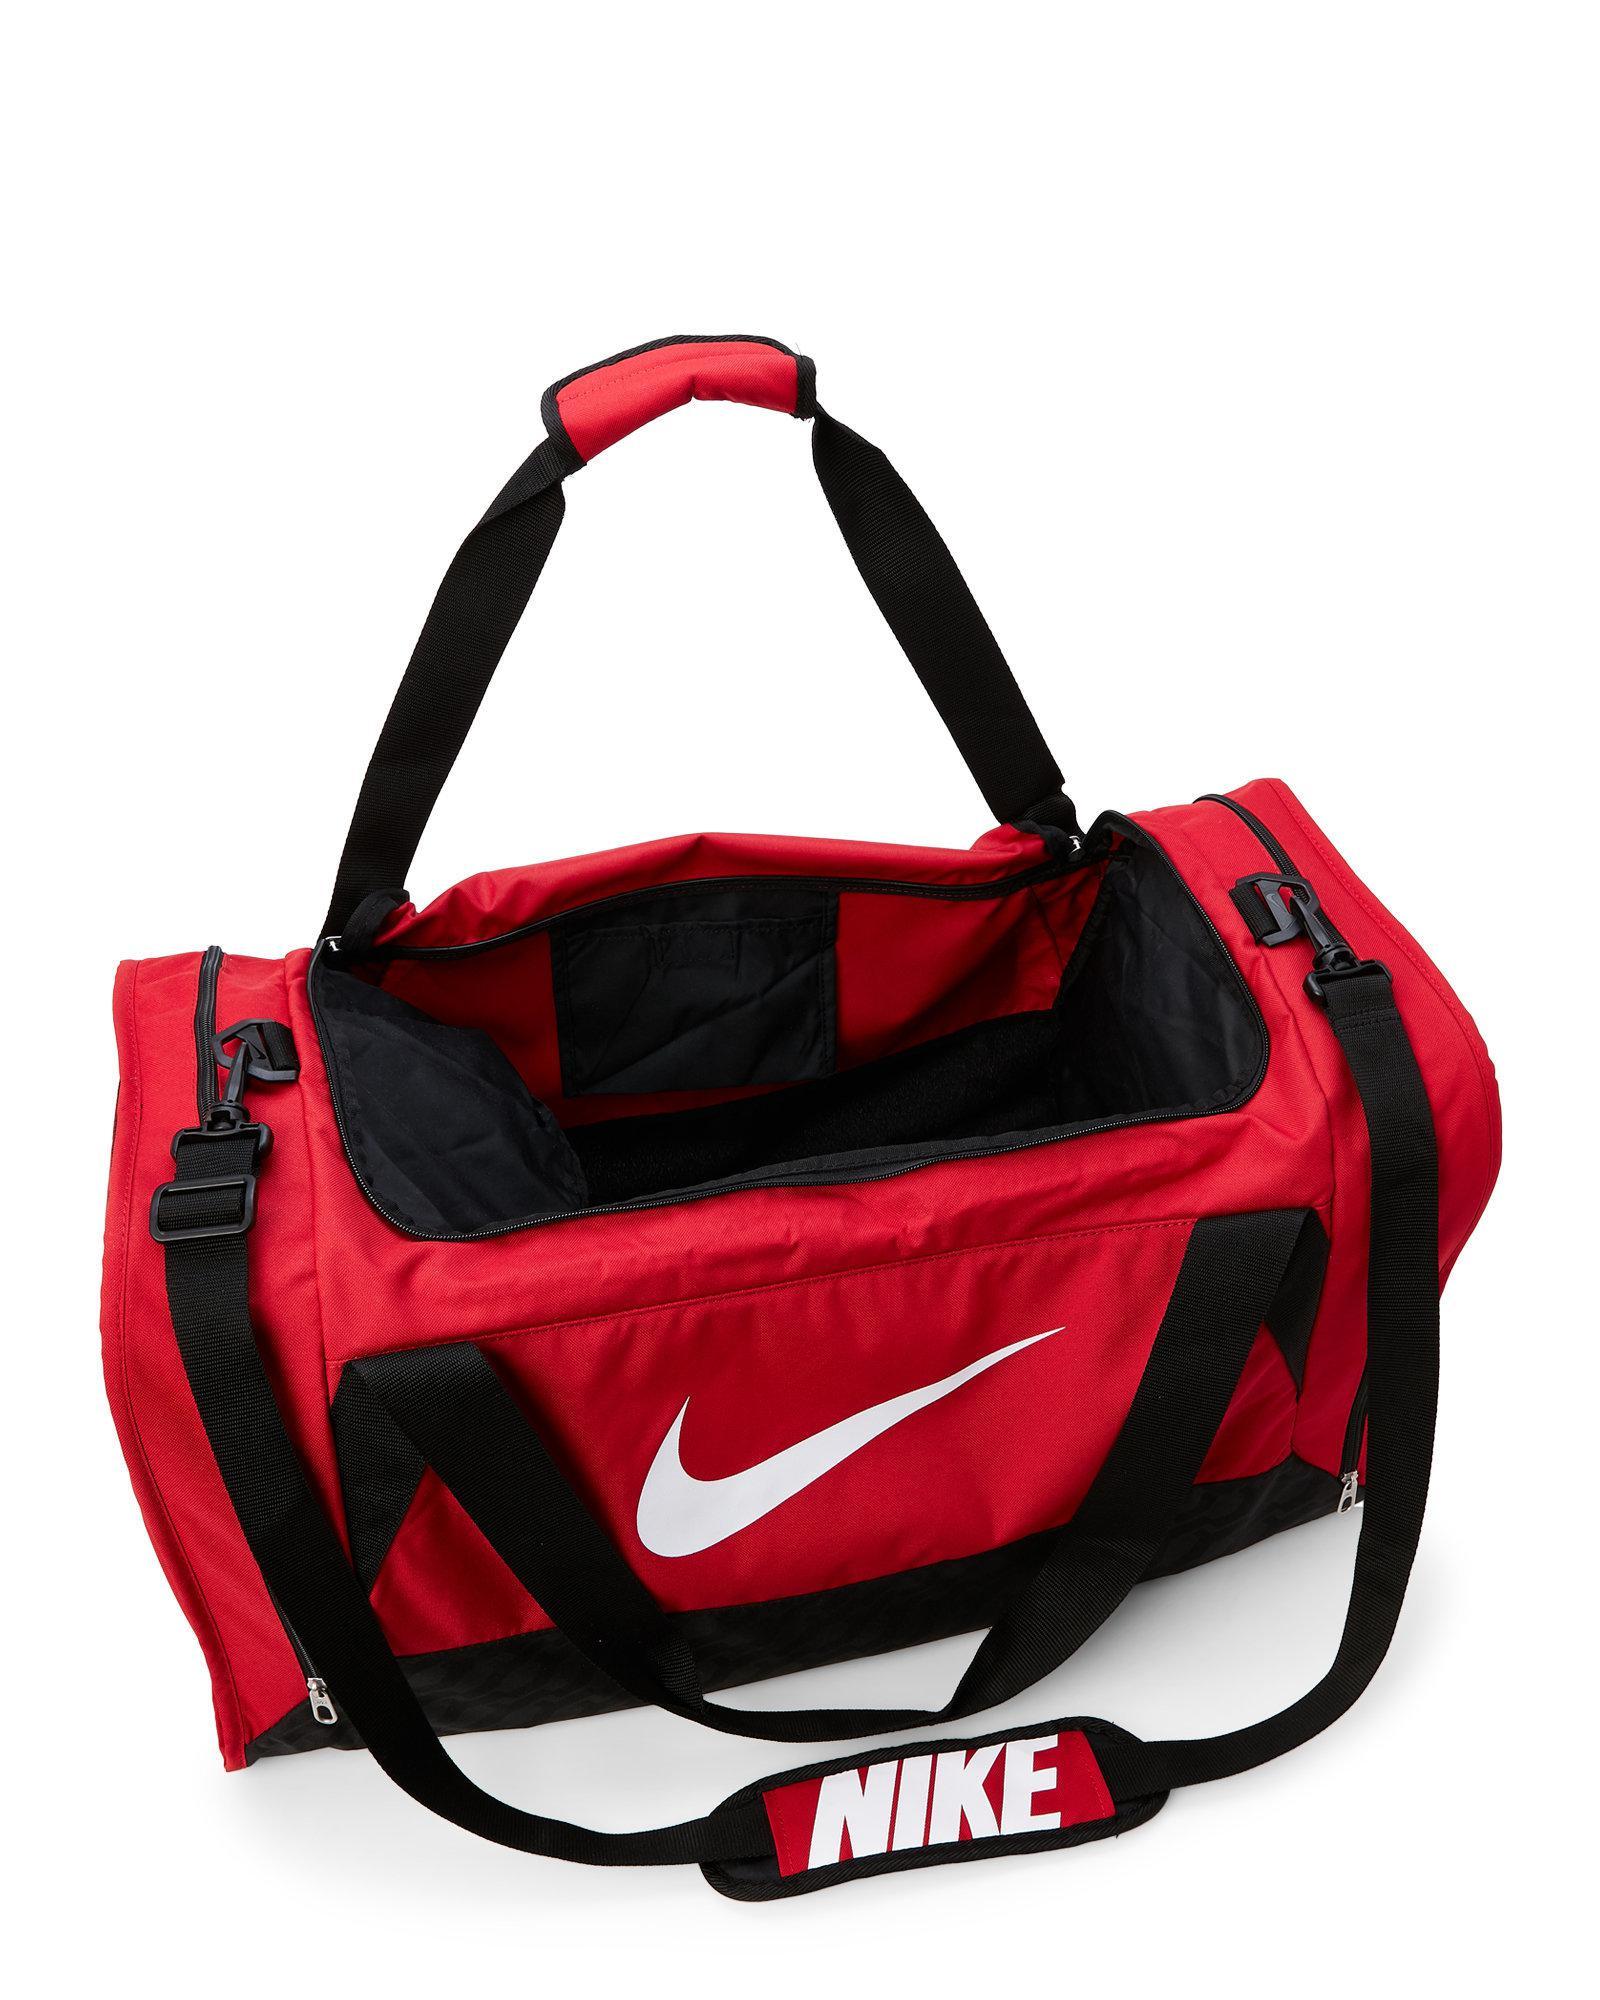 3bb5585ab02b Lyst - Nike Gym Red Brasilia Medium Duffel Bag in Red for Men